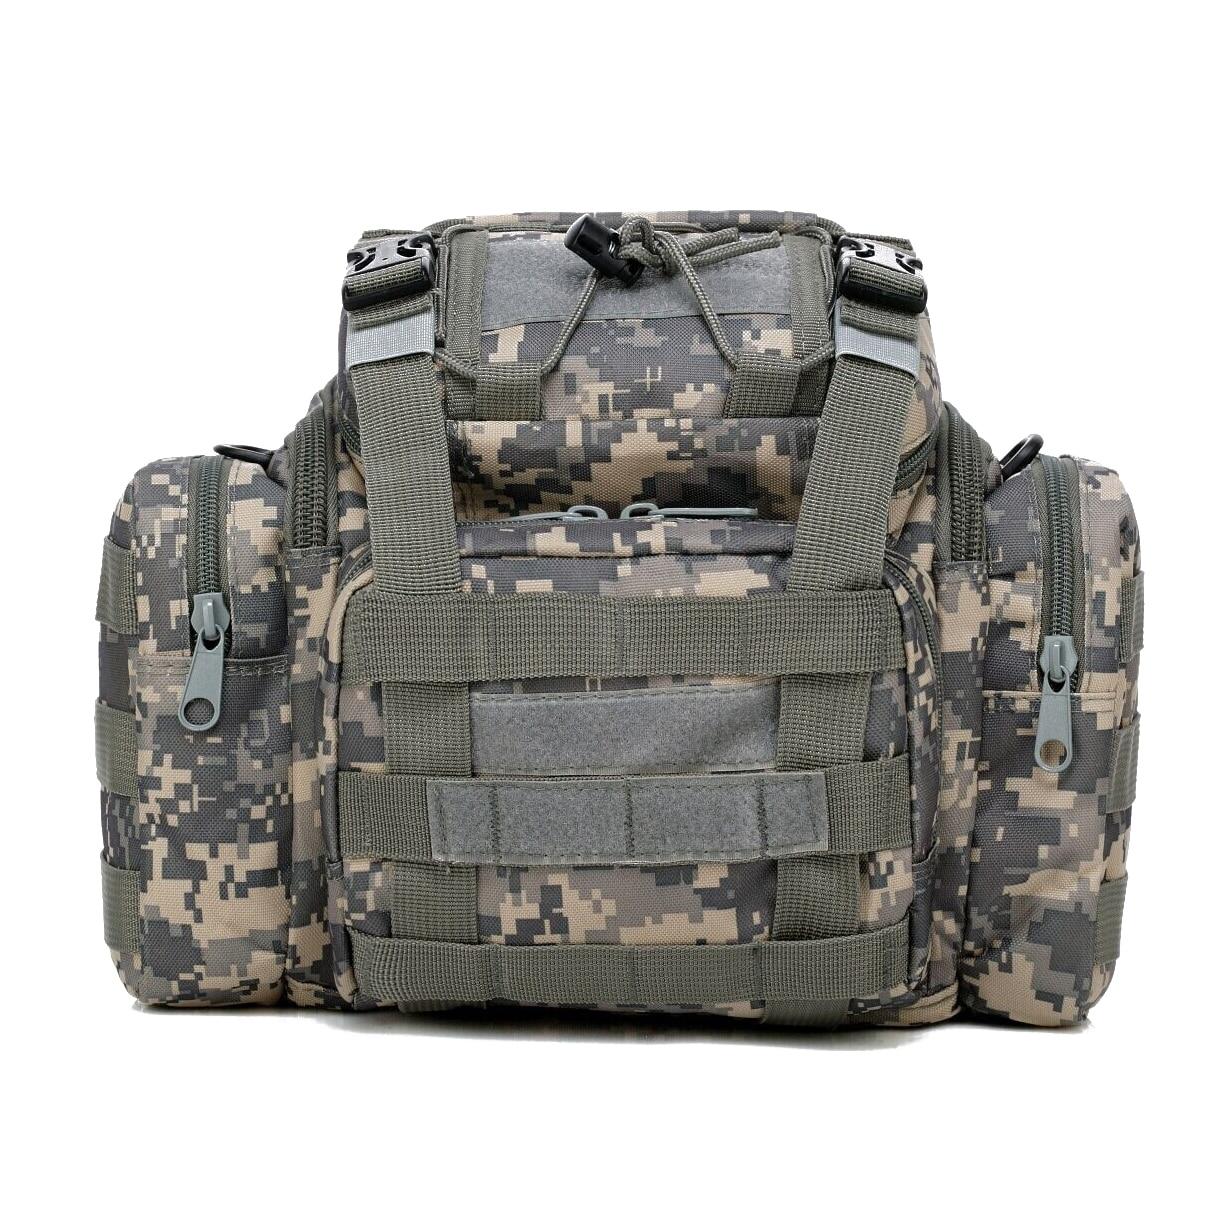 Sea/<font><b>Carp</b></font>/Fly Fishing Tackle Bag Waterproof Storage Waist Shoulder Carry Case ACU Camouflage